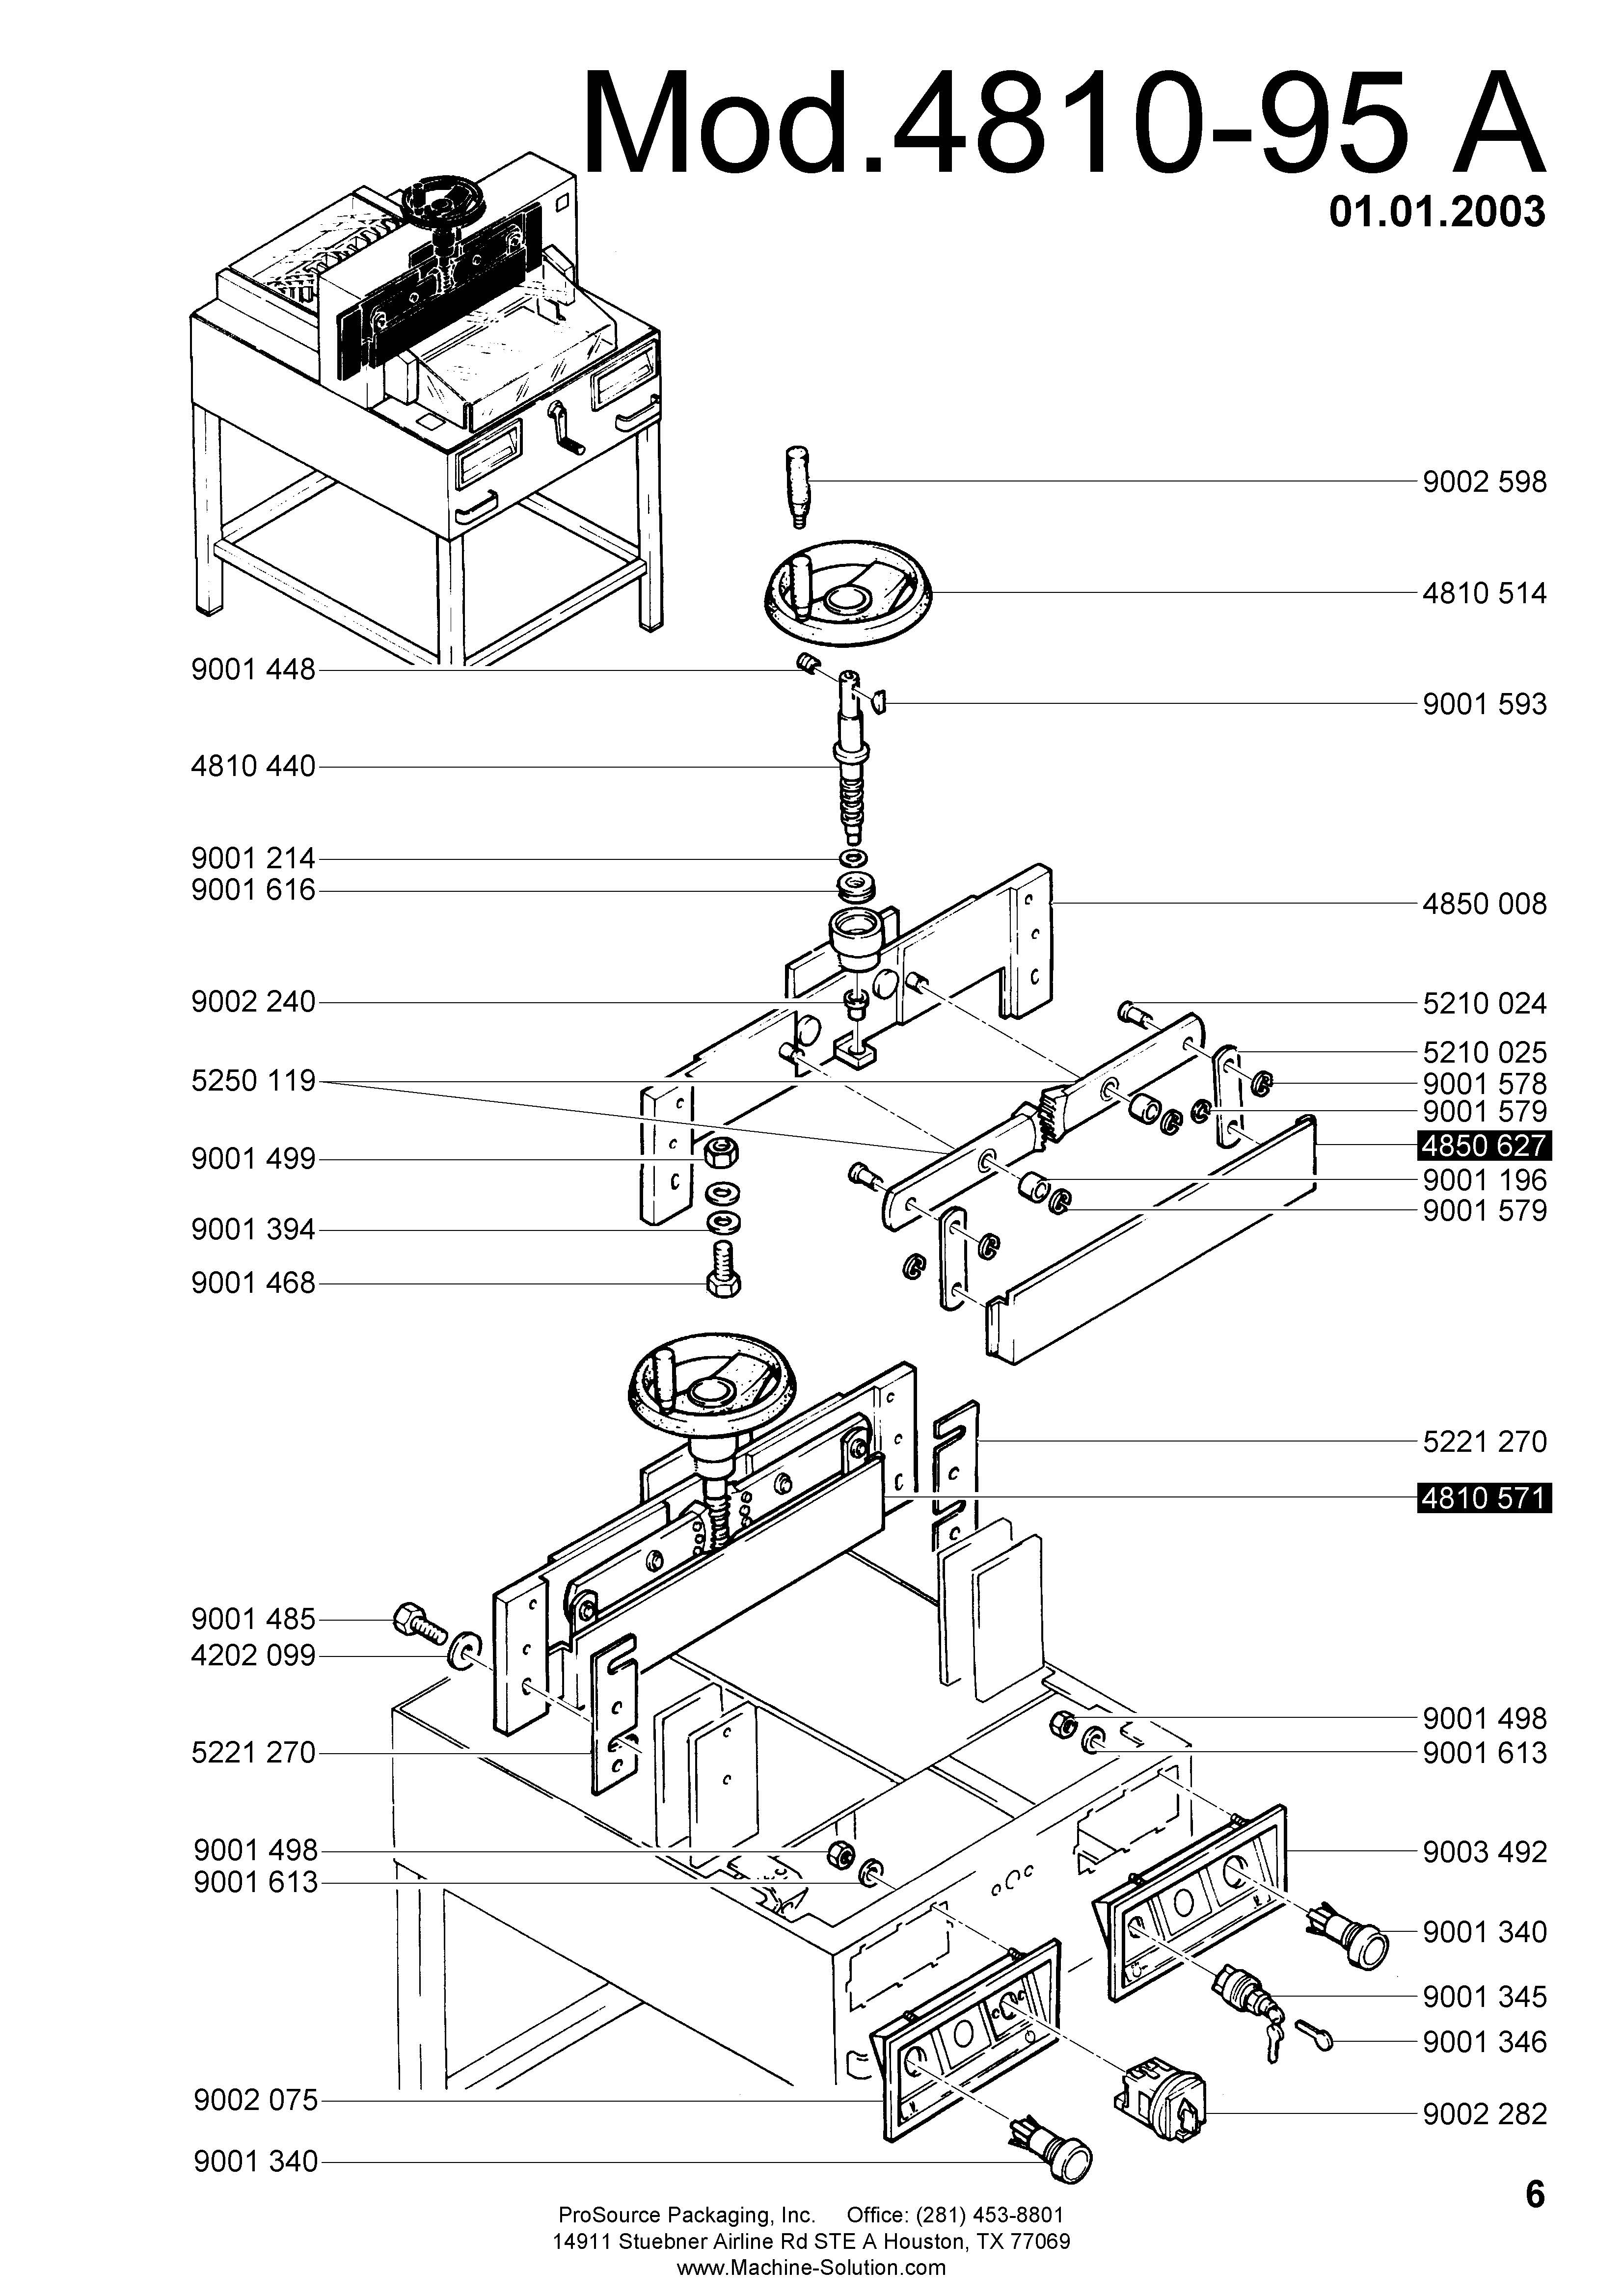 parts assistant mbm triumph 4810 95 a paper cutter rh machine solution com V 4810 White Round V 4810 White Round